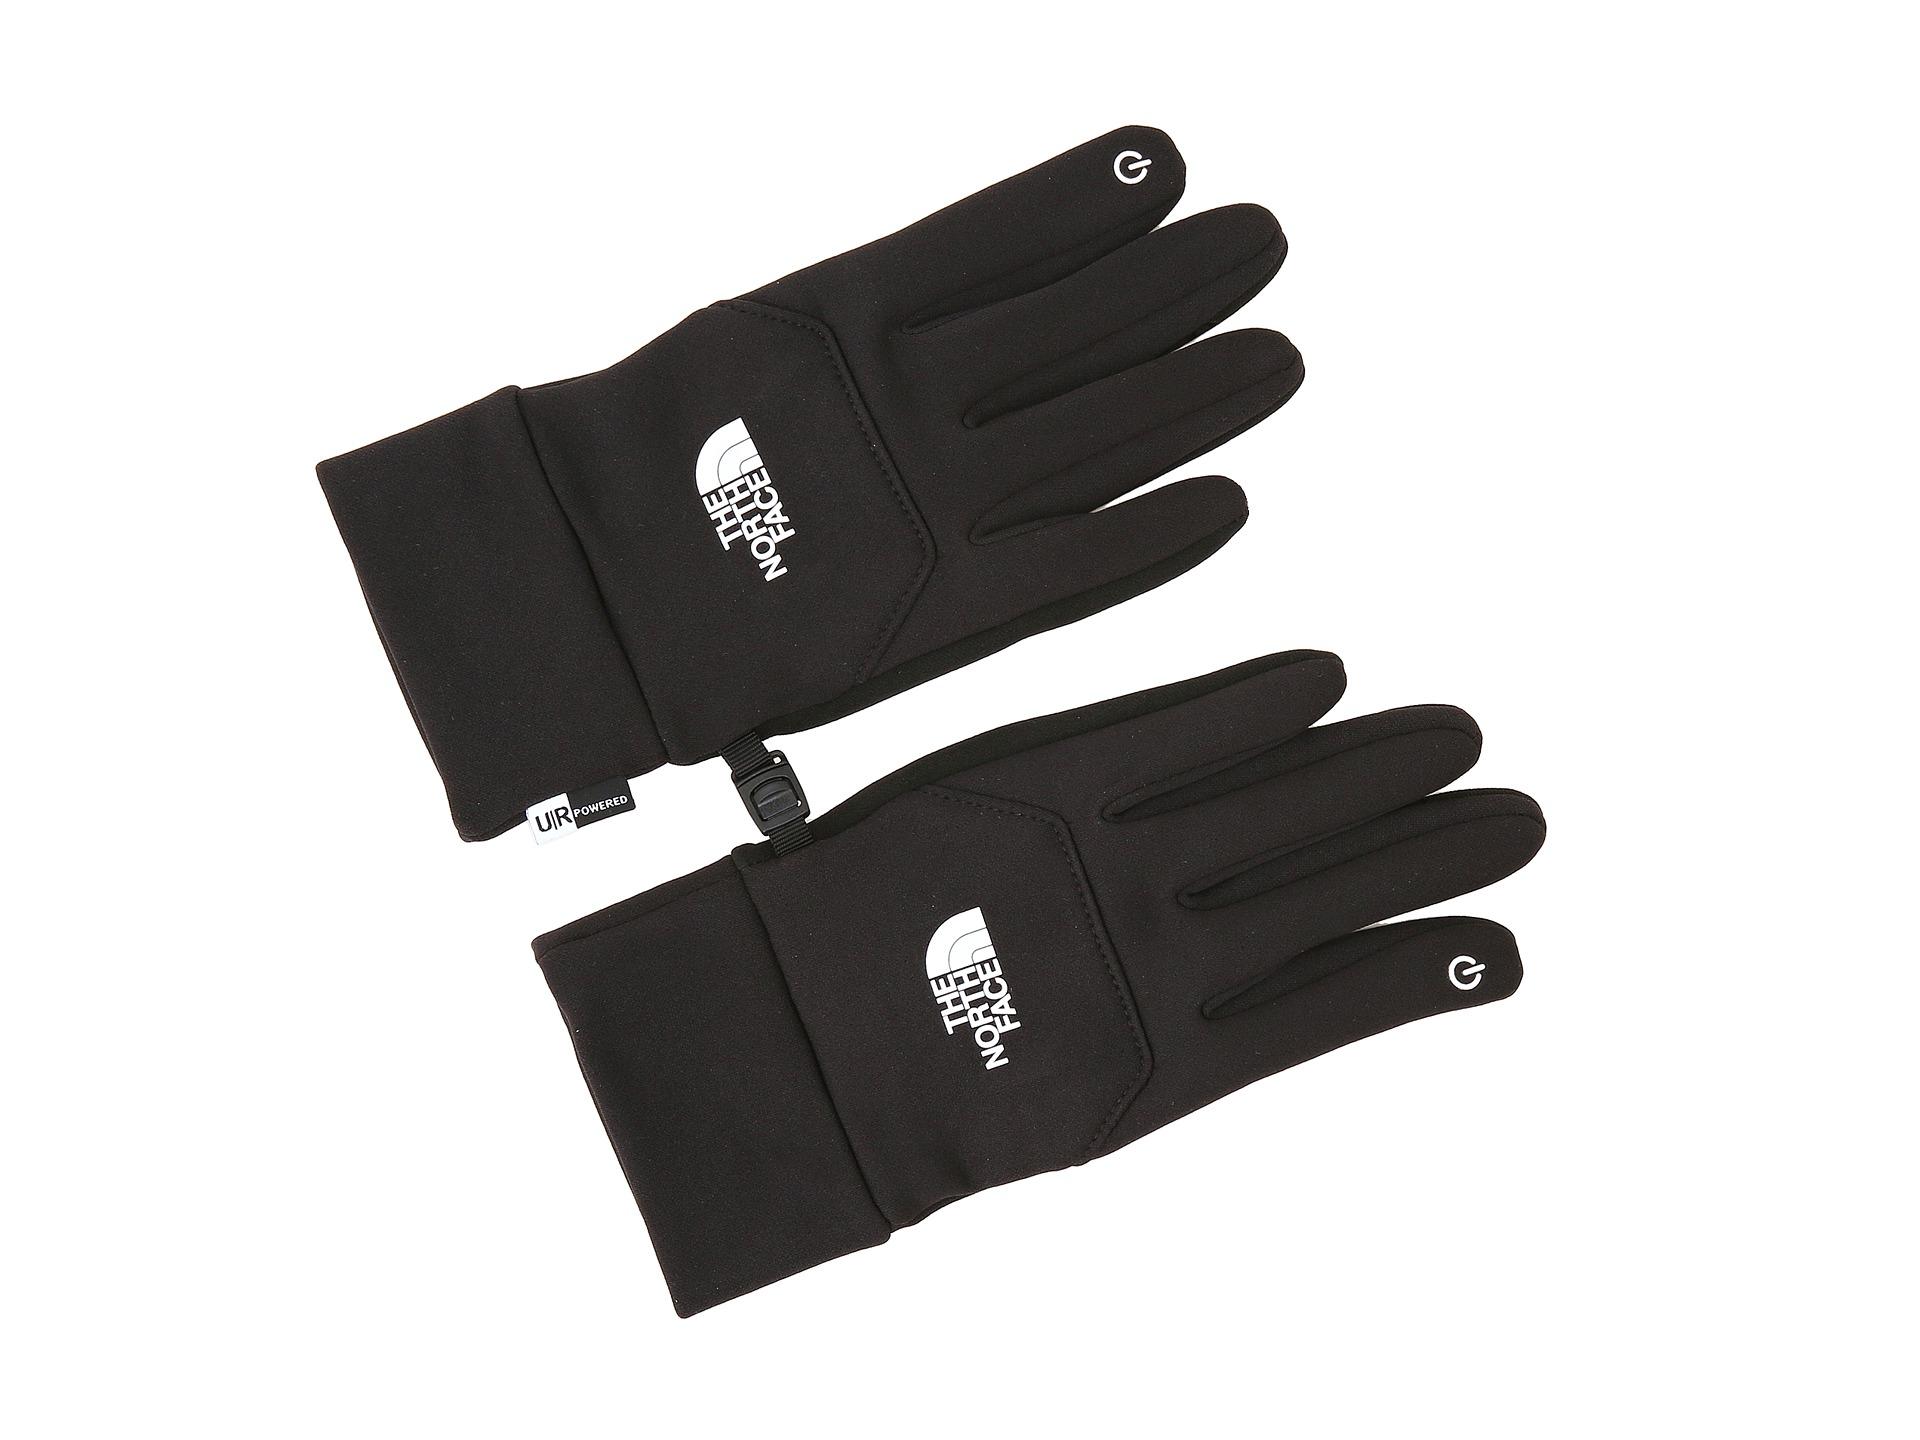 Mens etip gloves - Video